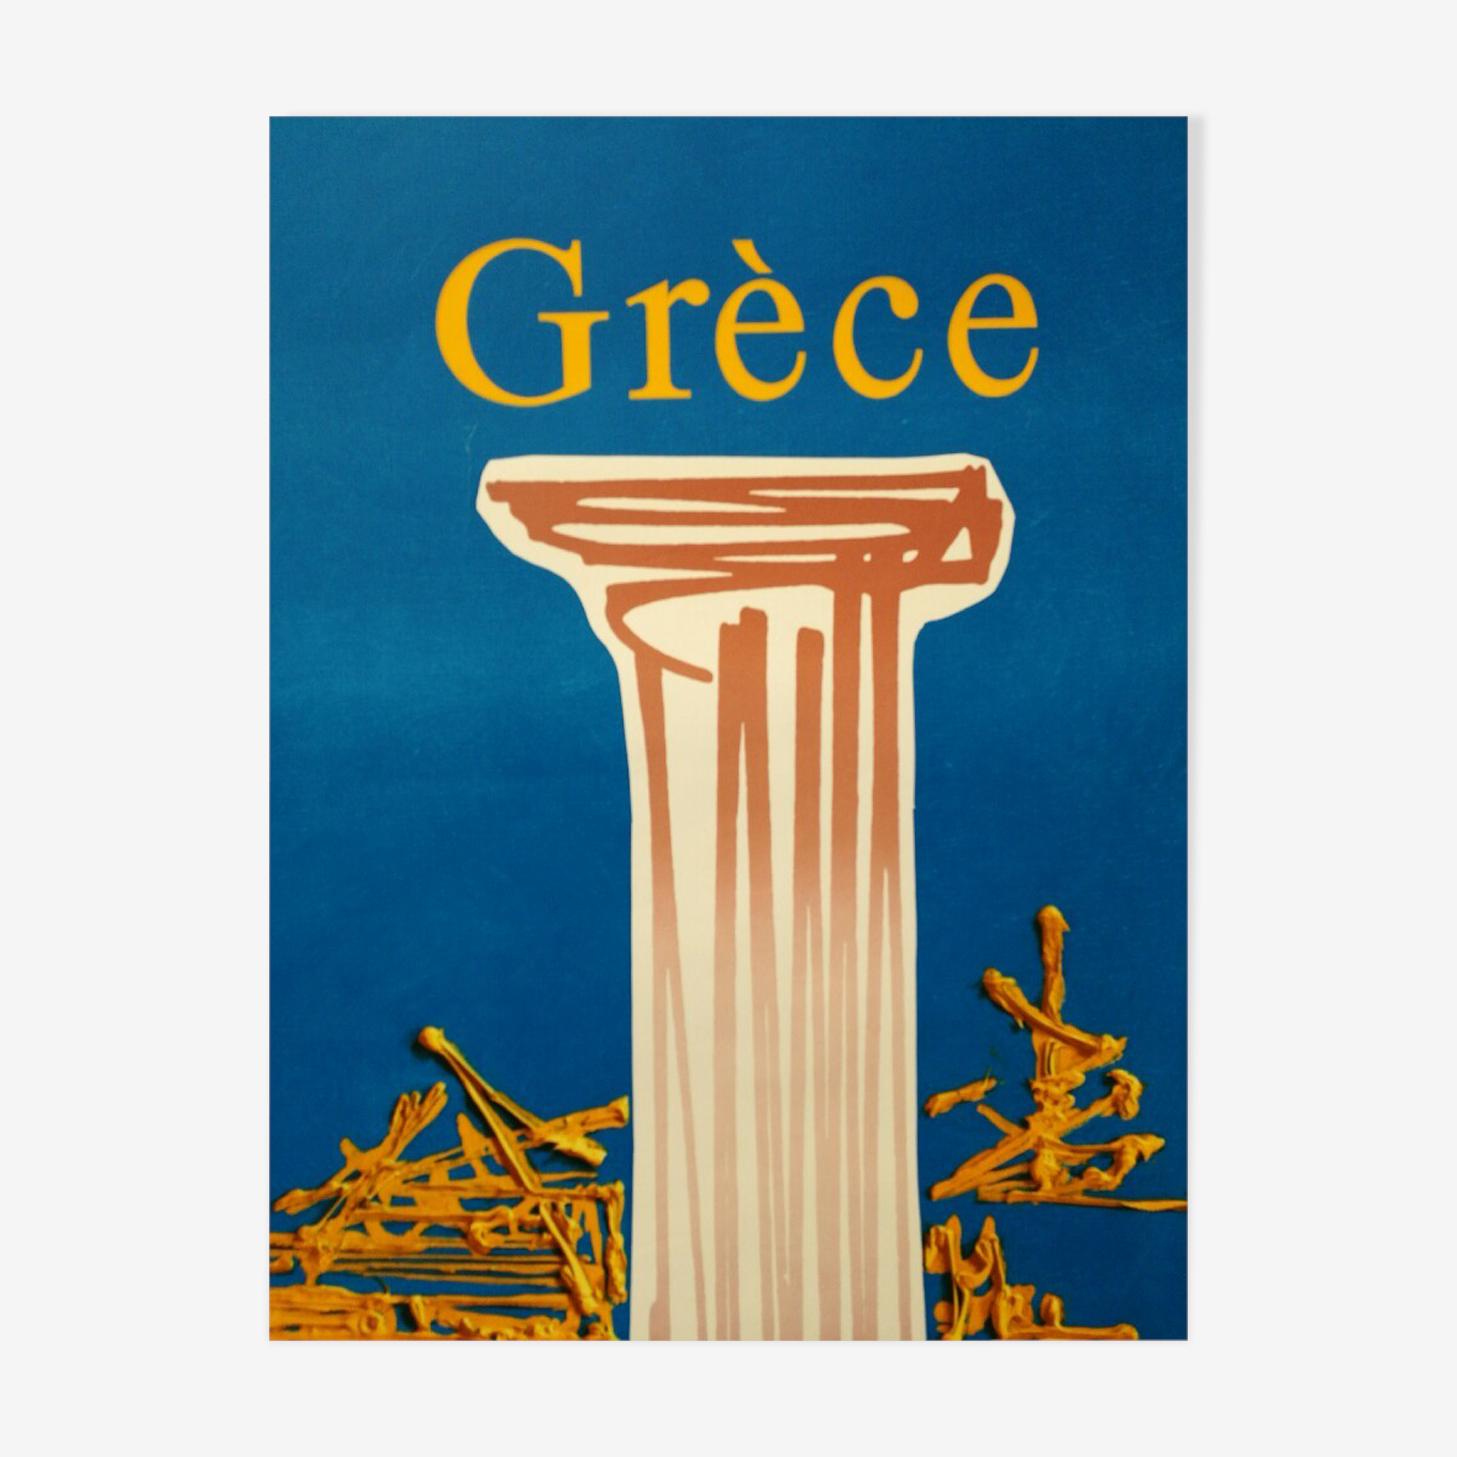 Original poster Air France Circa 1970